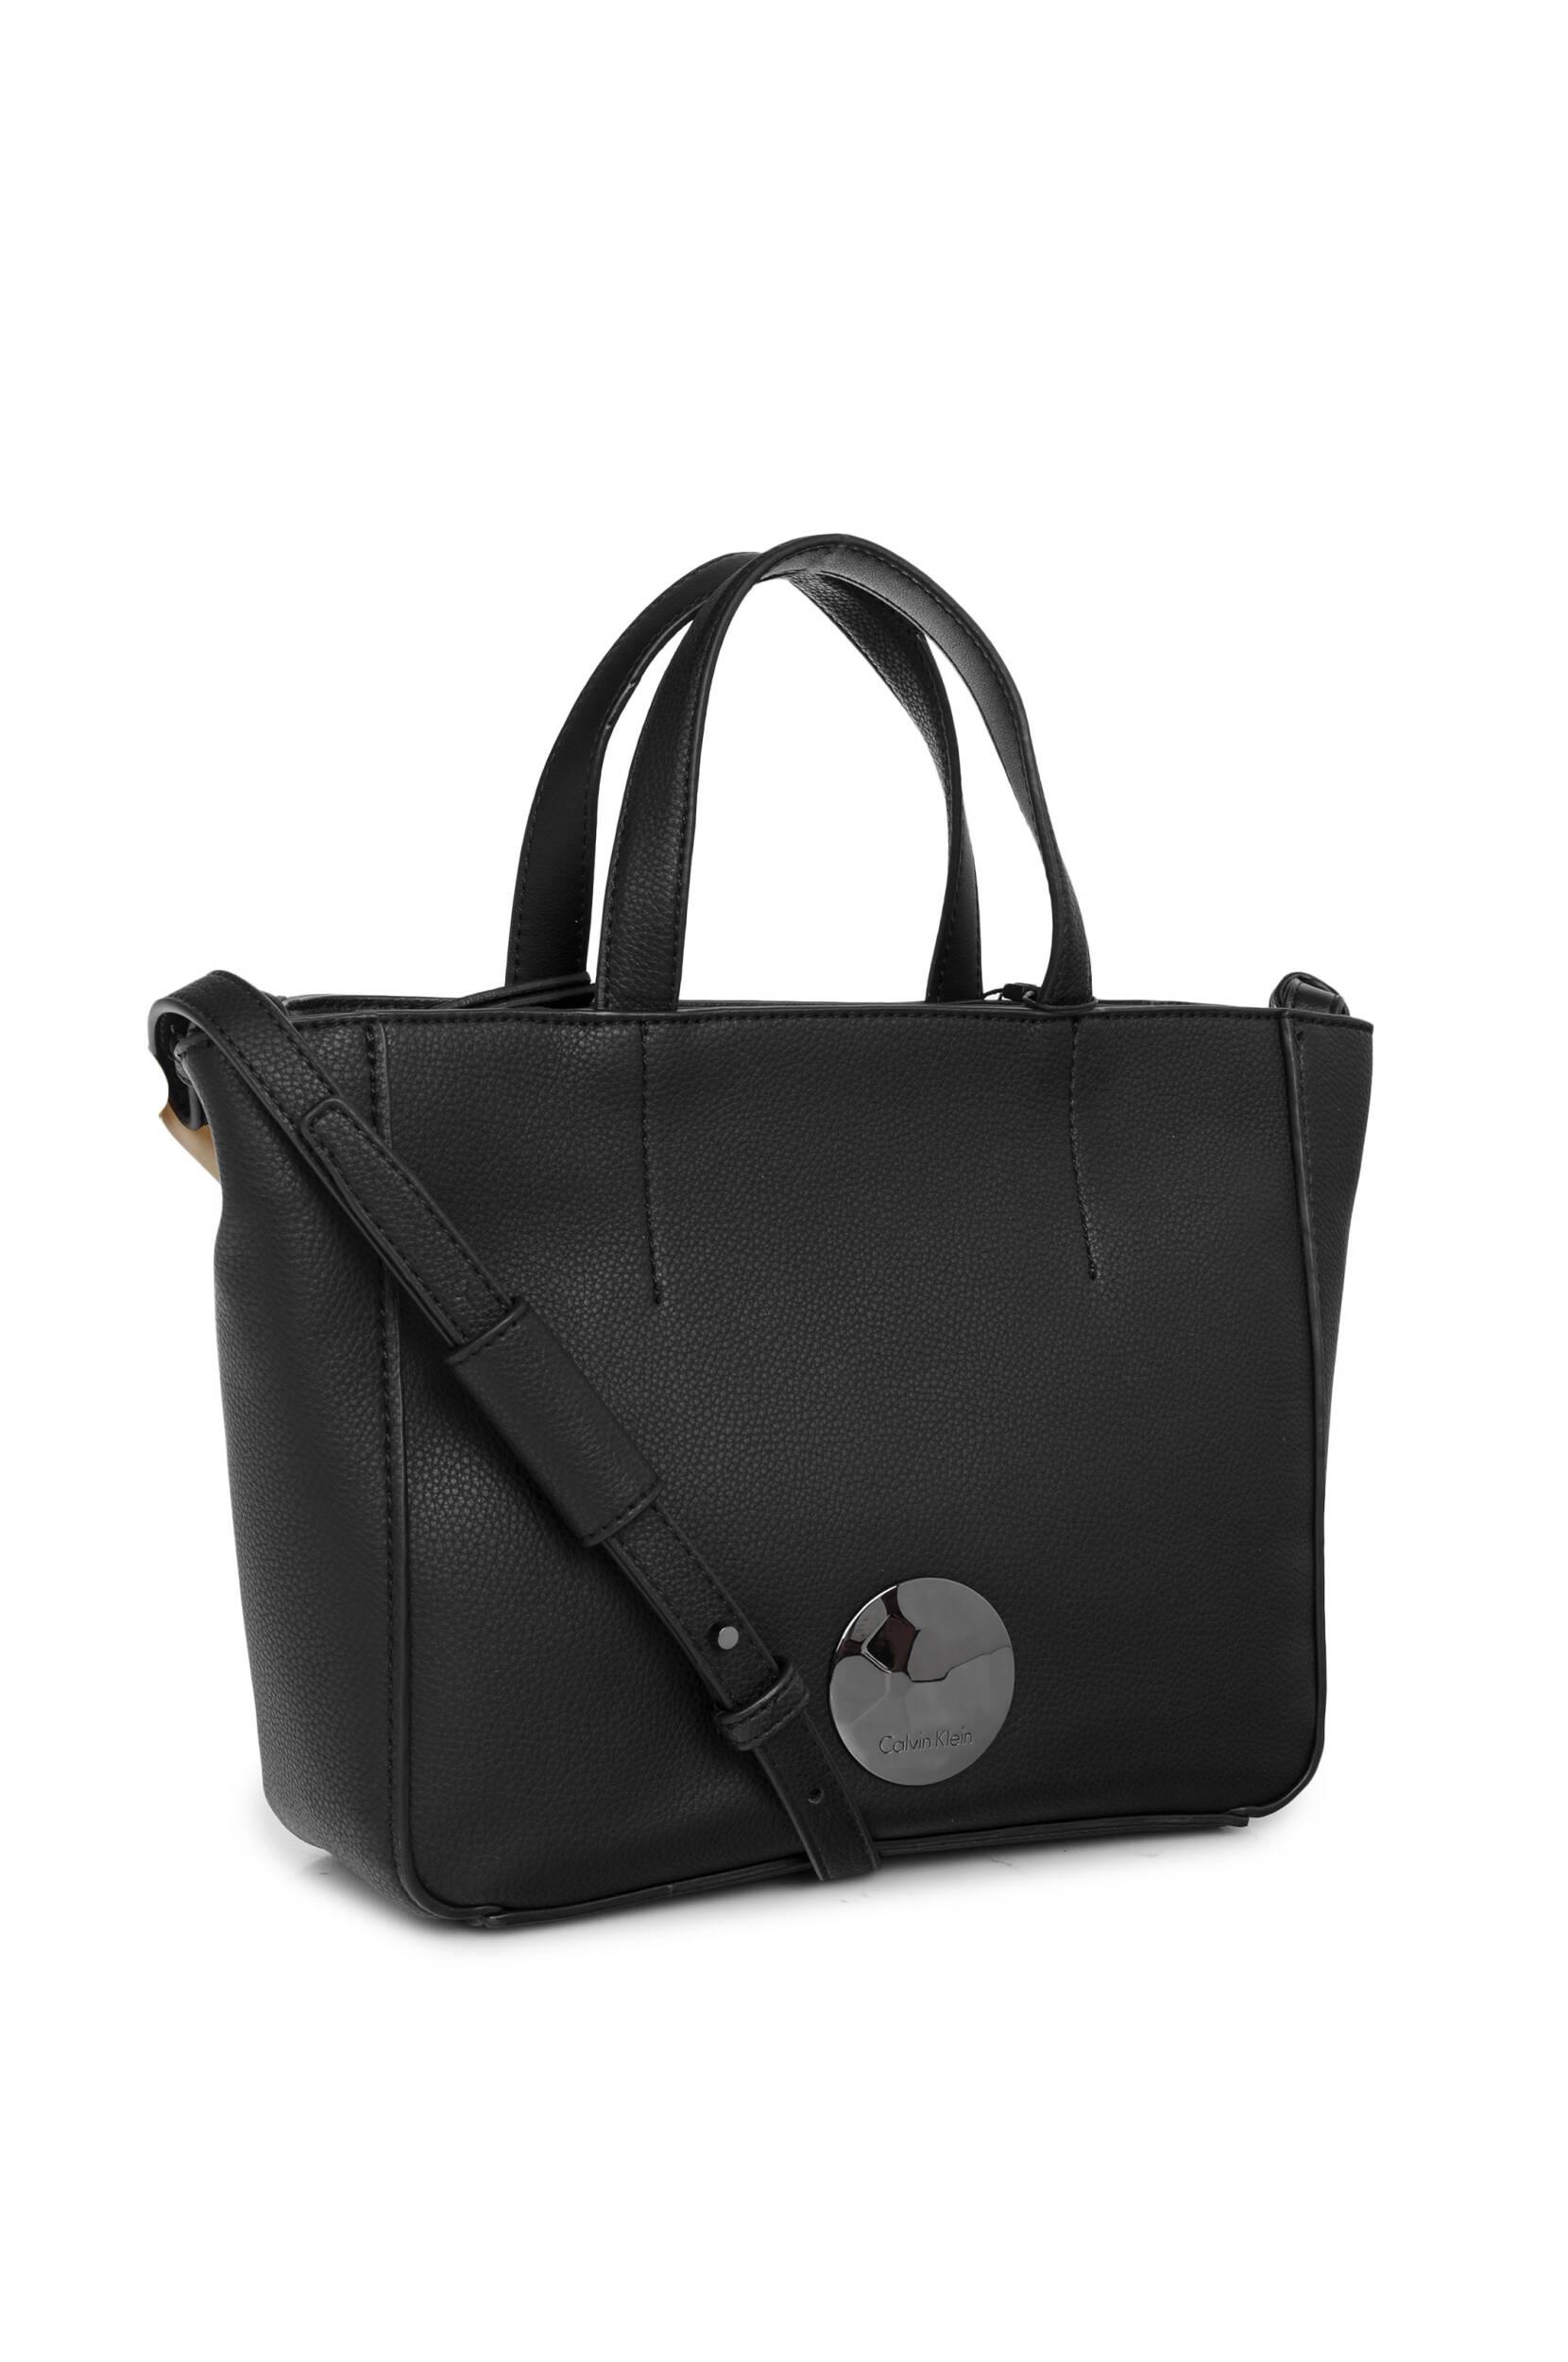 33d46b5d73cf9 Olivia Mini Tote shopper bag Calvin Klein